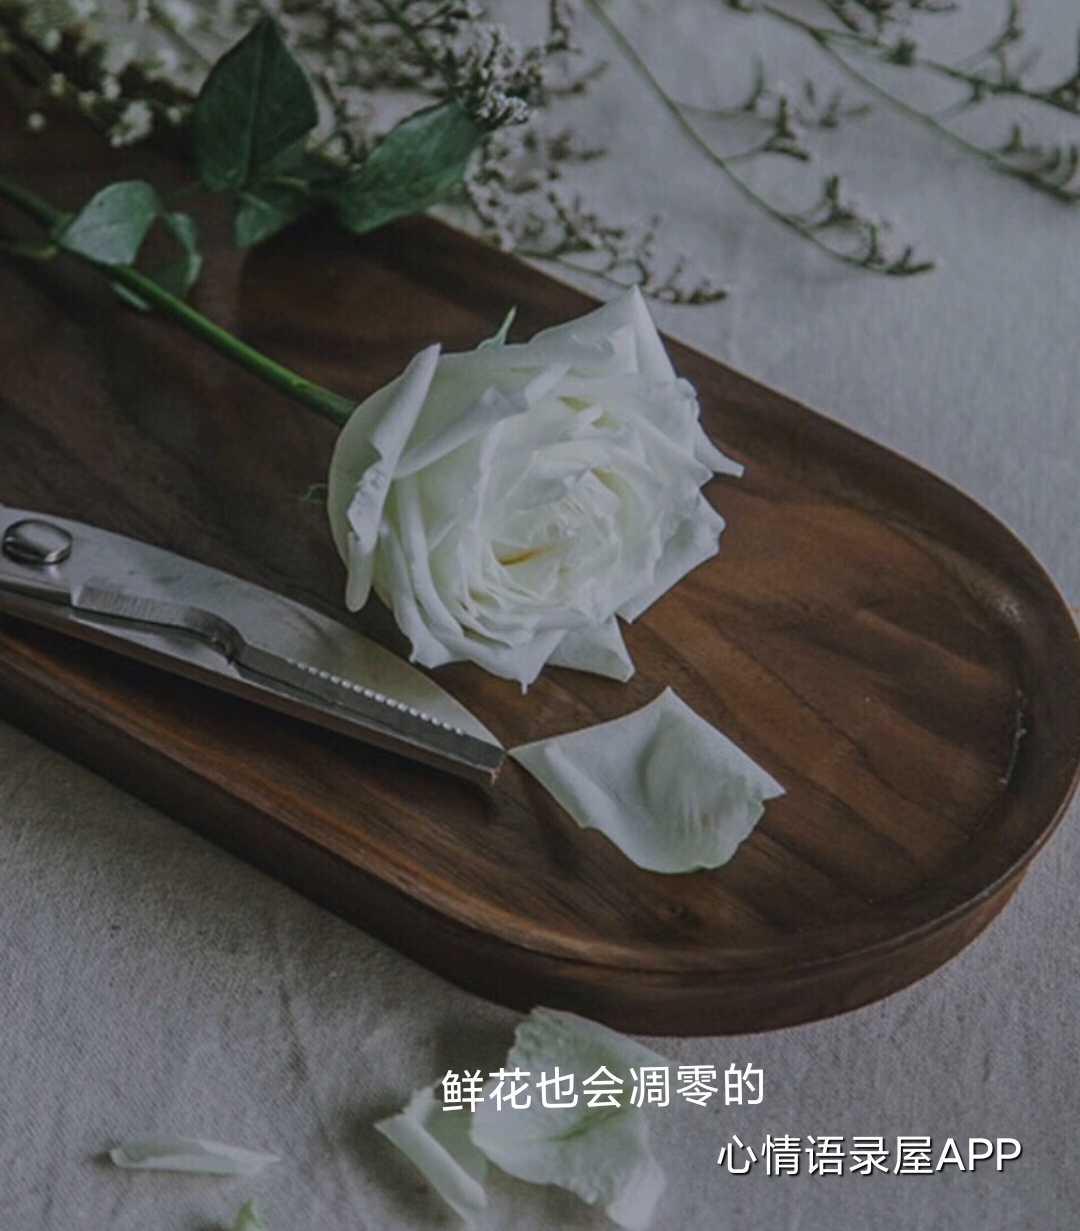 http://www.58100.com/index/detail/763350